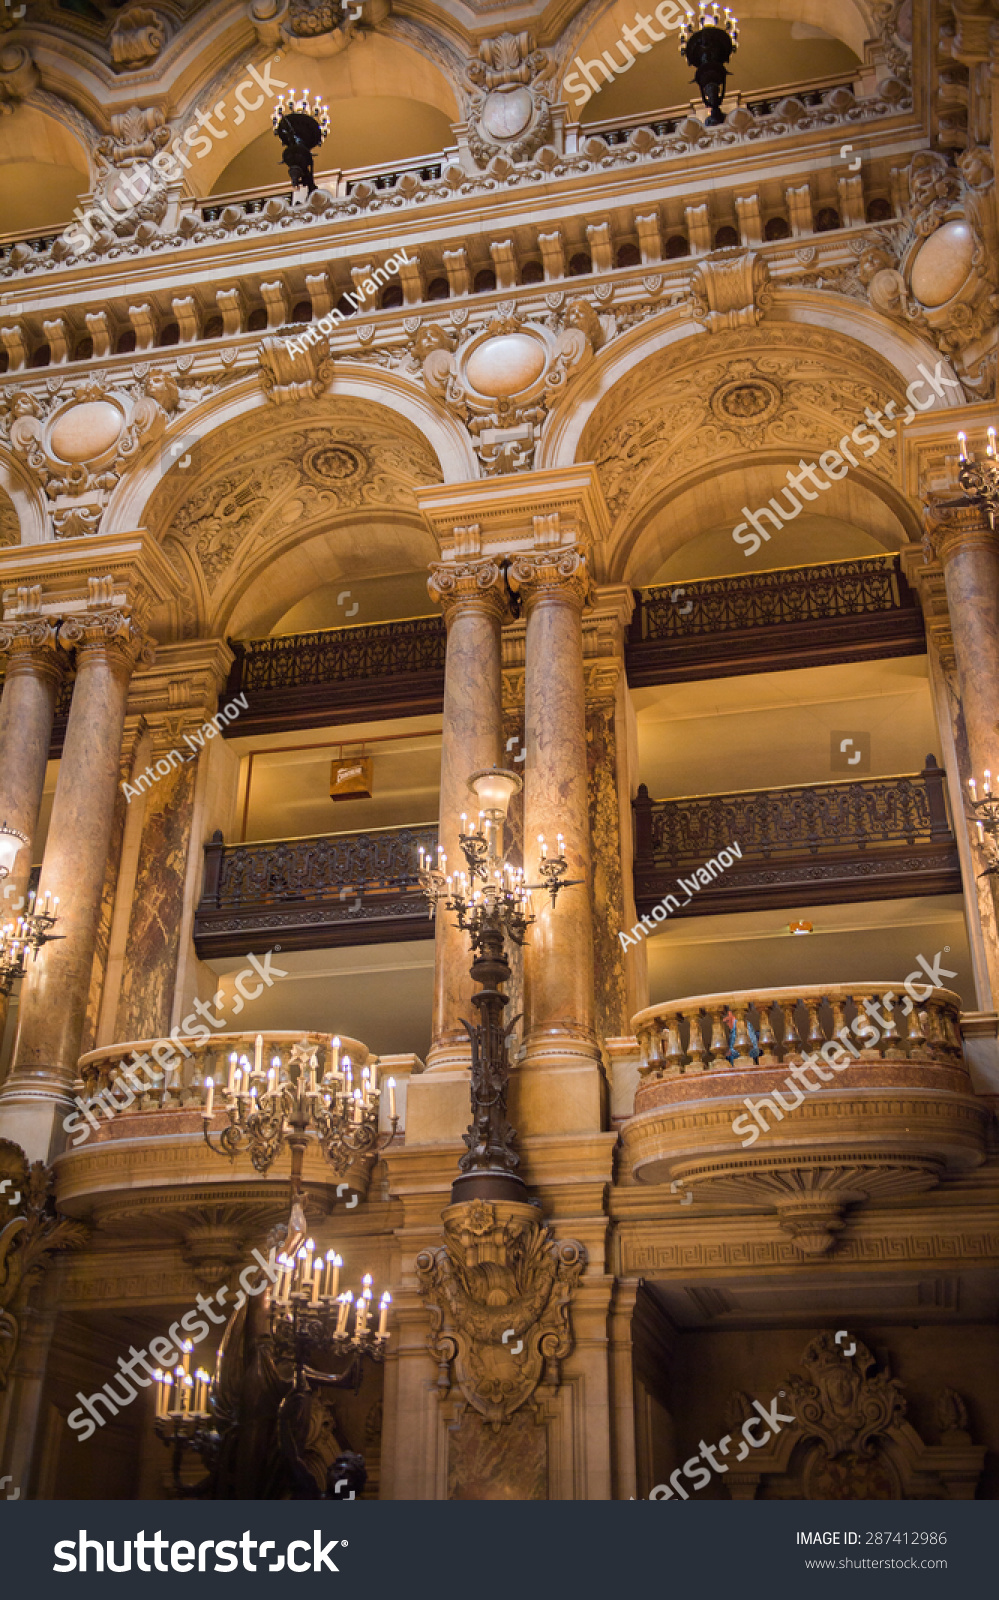 Paris France Jun 6 2015 Interior Stock Photo 287412986